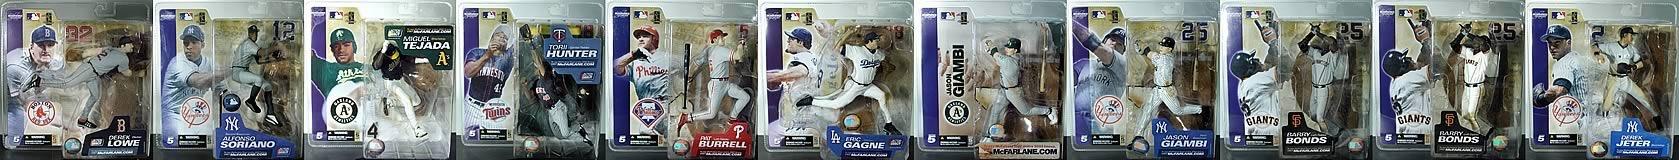 Baseball (Series 5) Figures